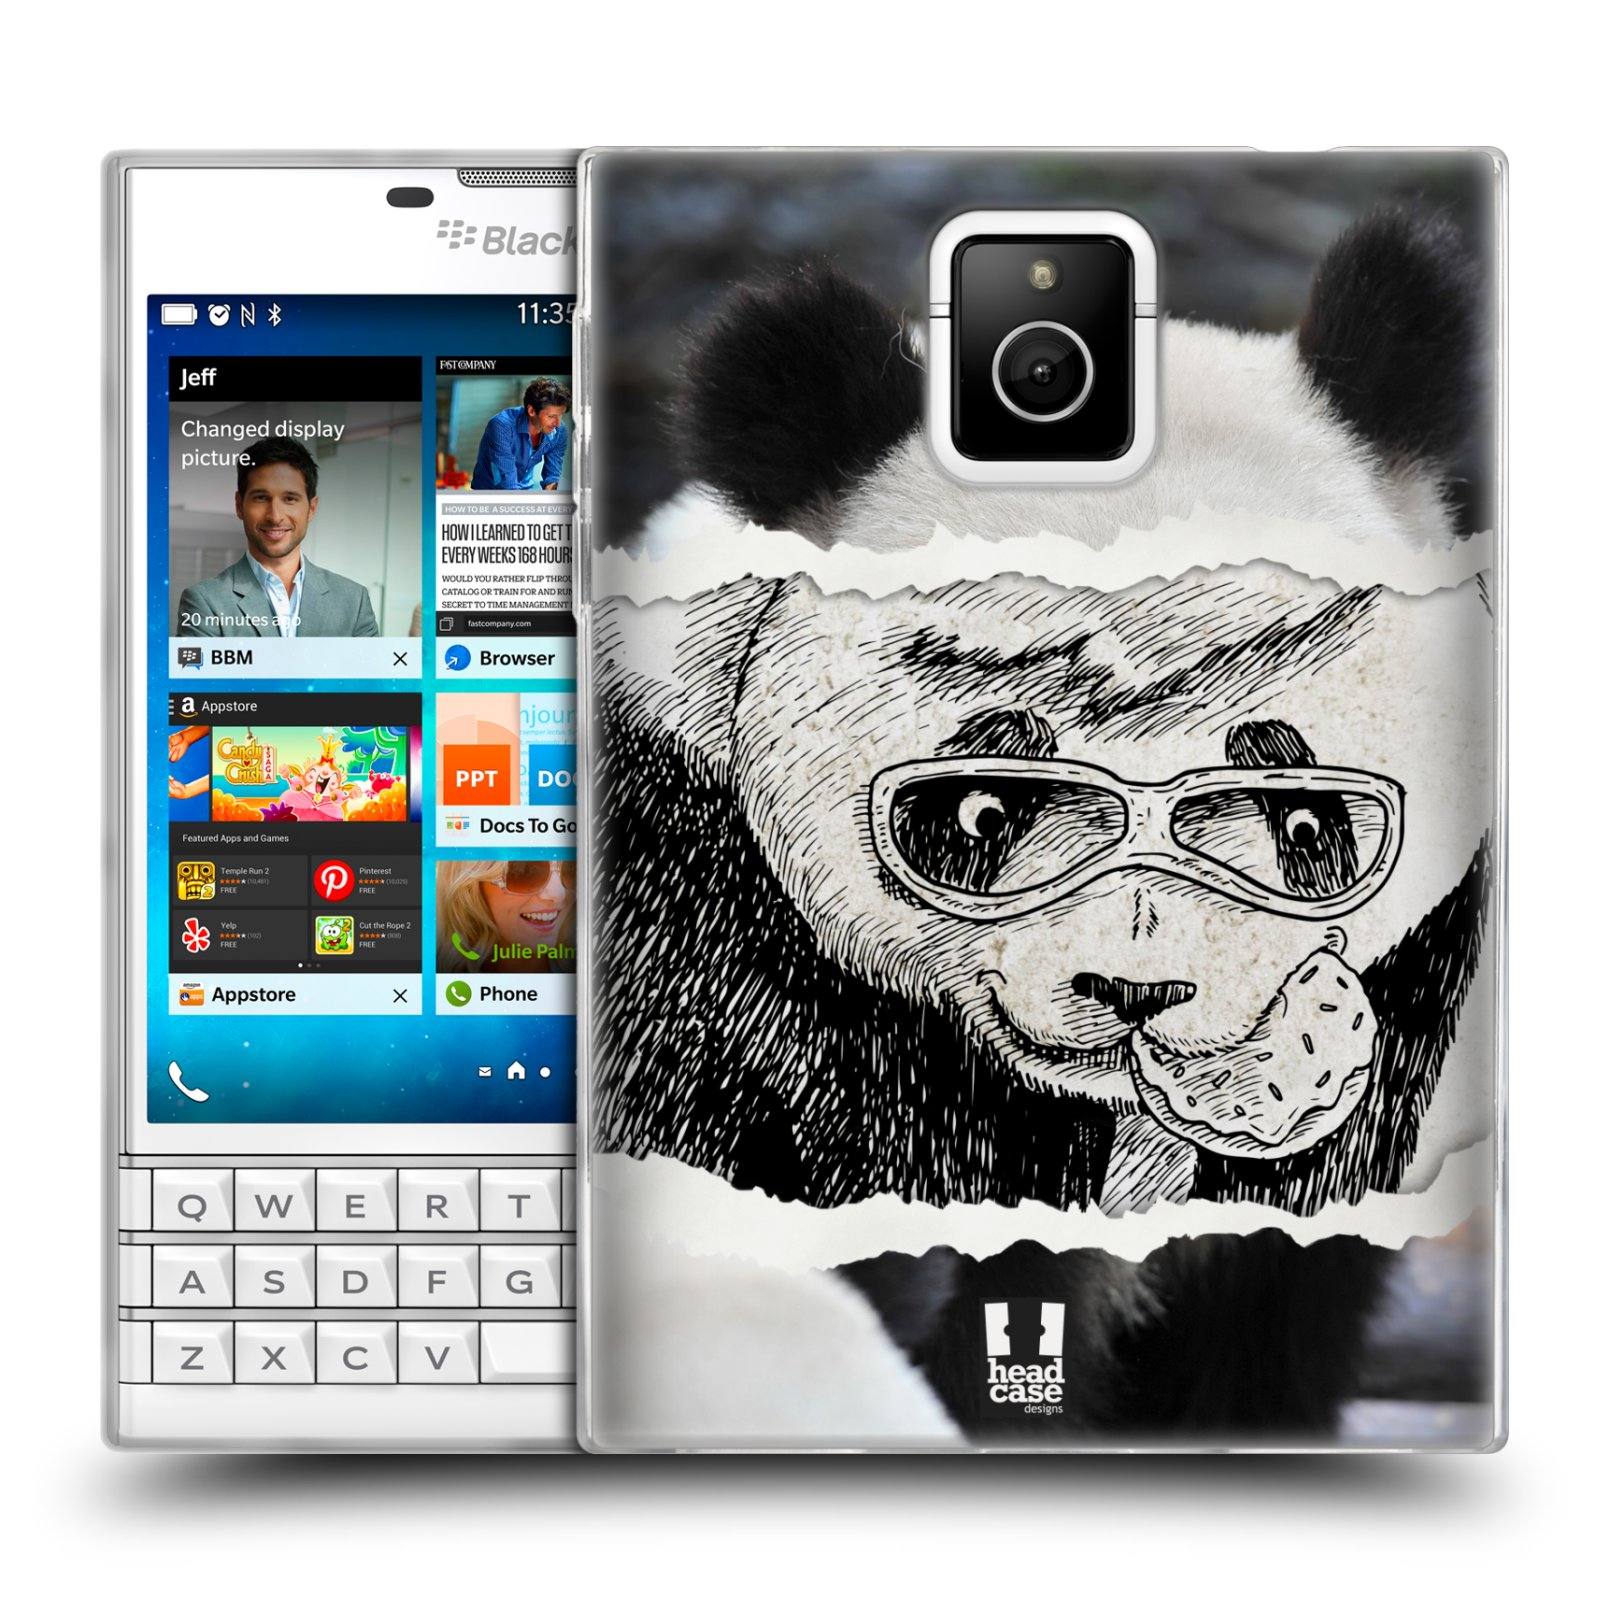 HEAD CASE silikonový obal na mobil Blackberry PASSPORT vzor zvířata koláž roztomilá panda